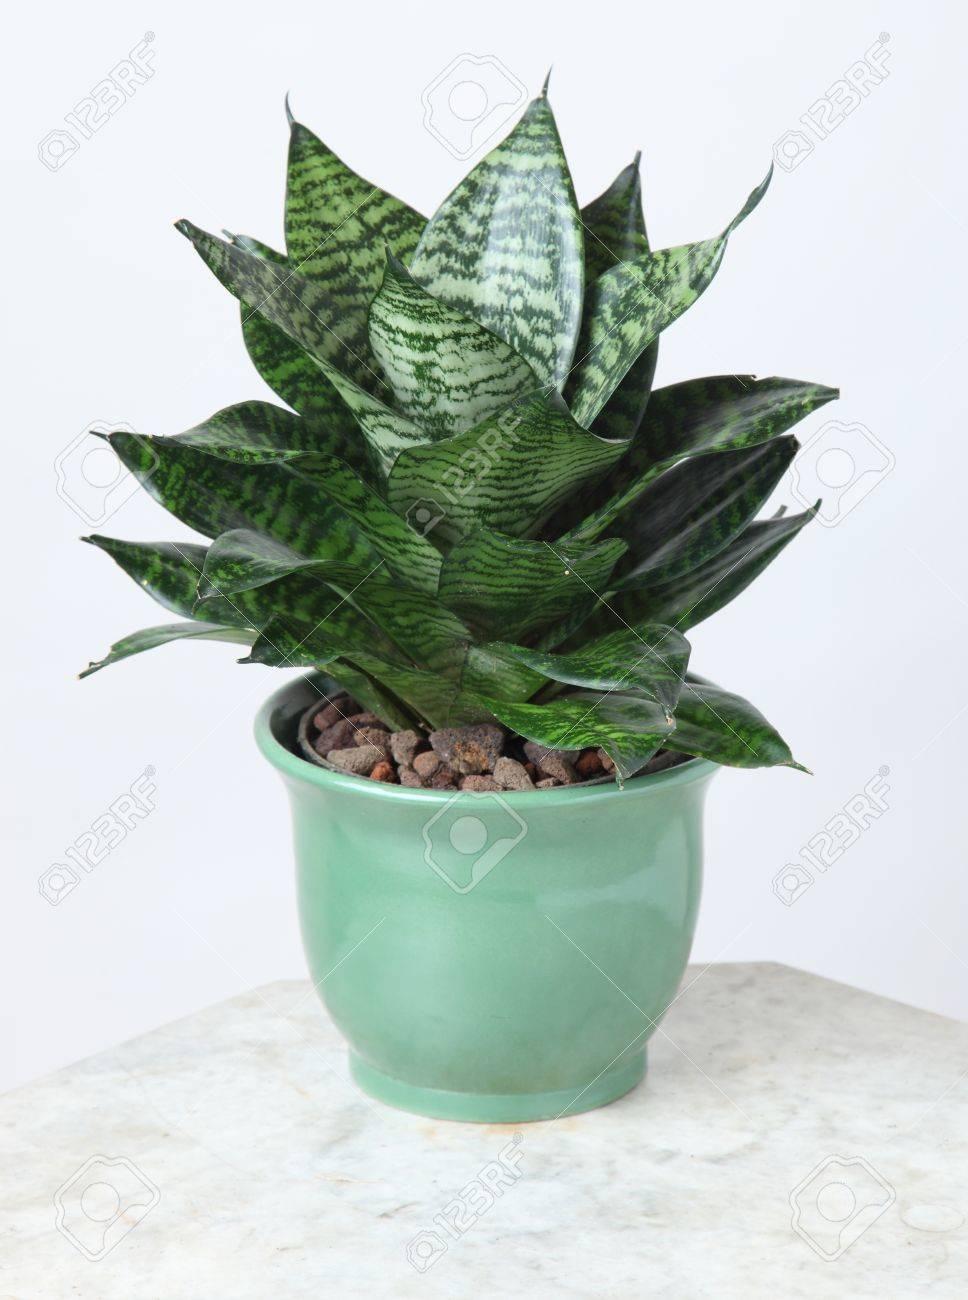 Ornamental Plants - 10587585